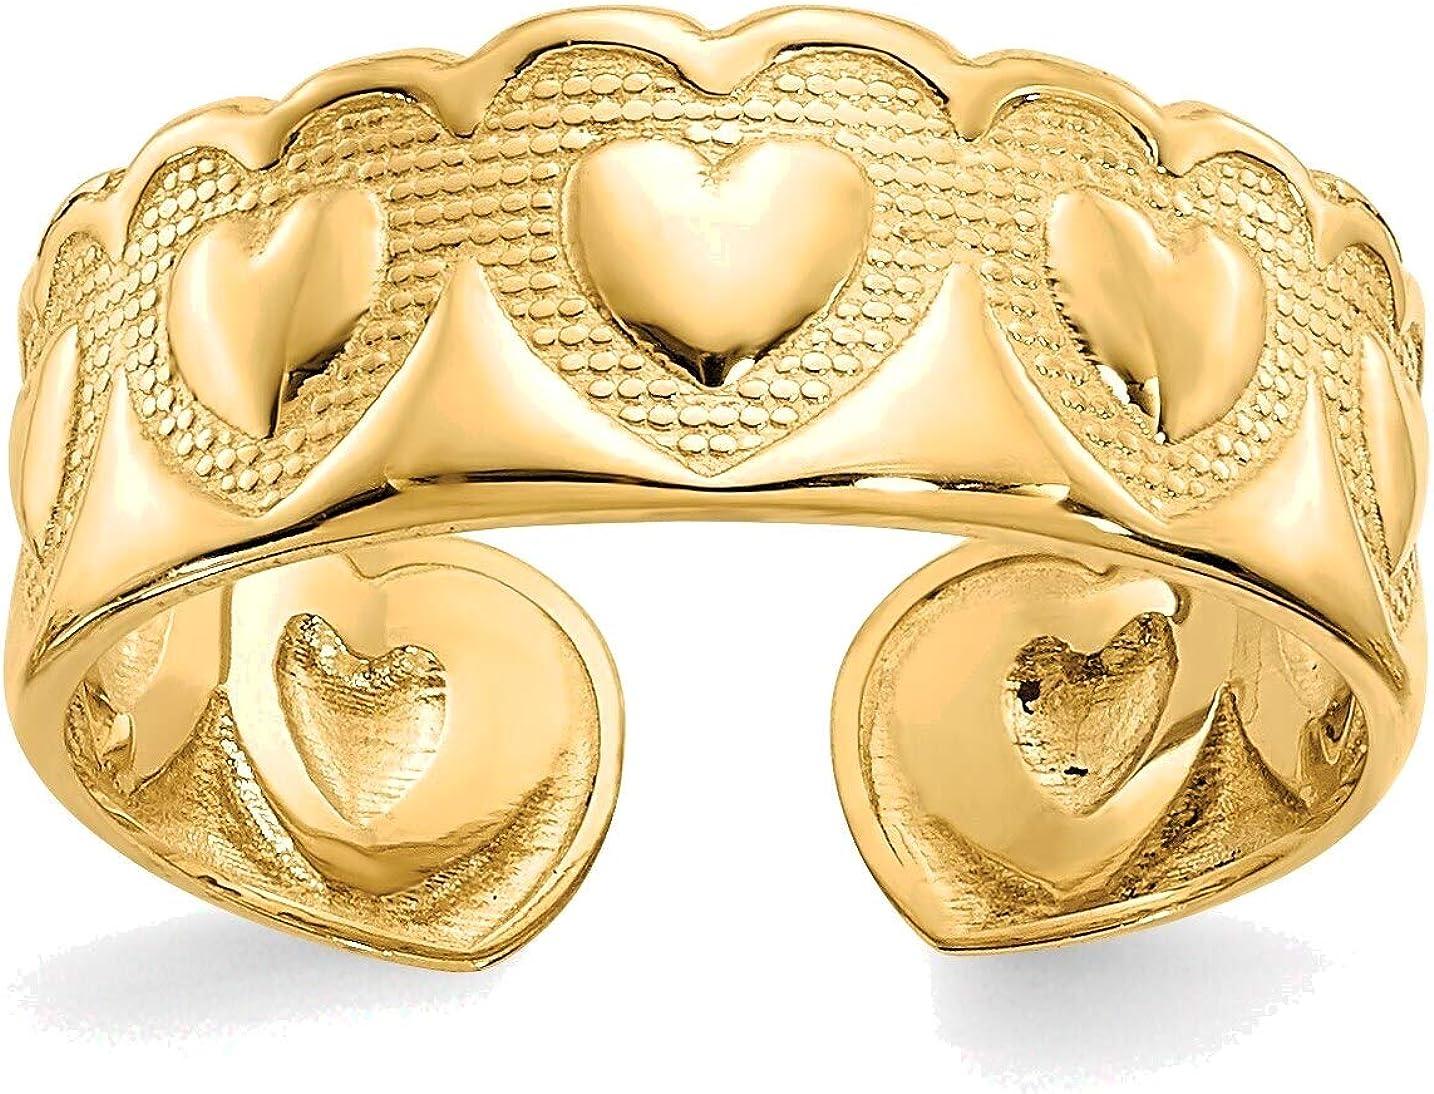 Bonyak Jewelry Heart Toe Ring in 14K Yellow Gold in Size 11